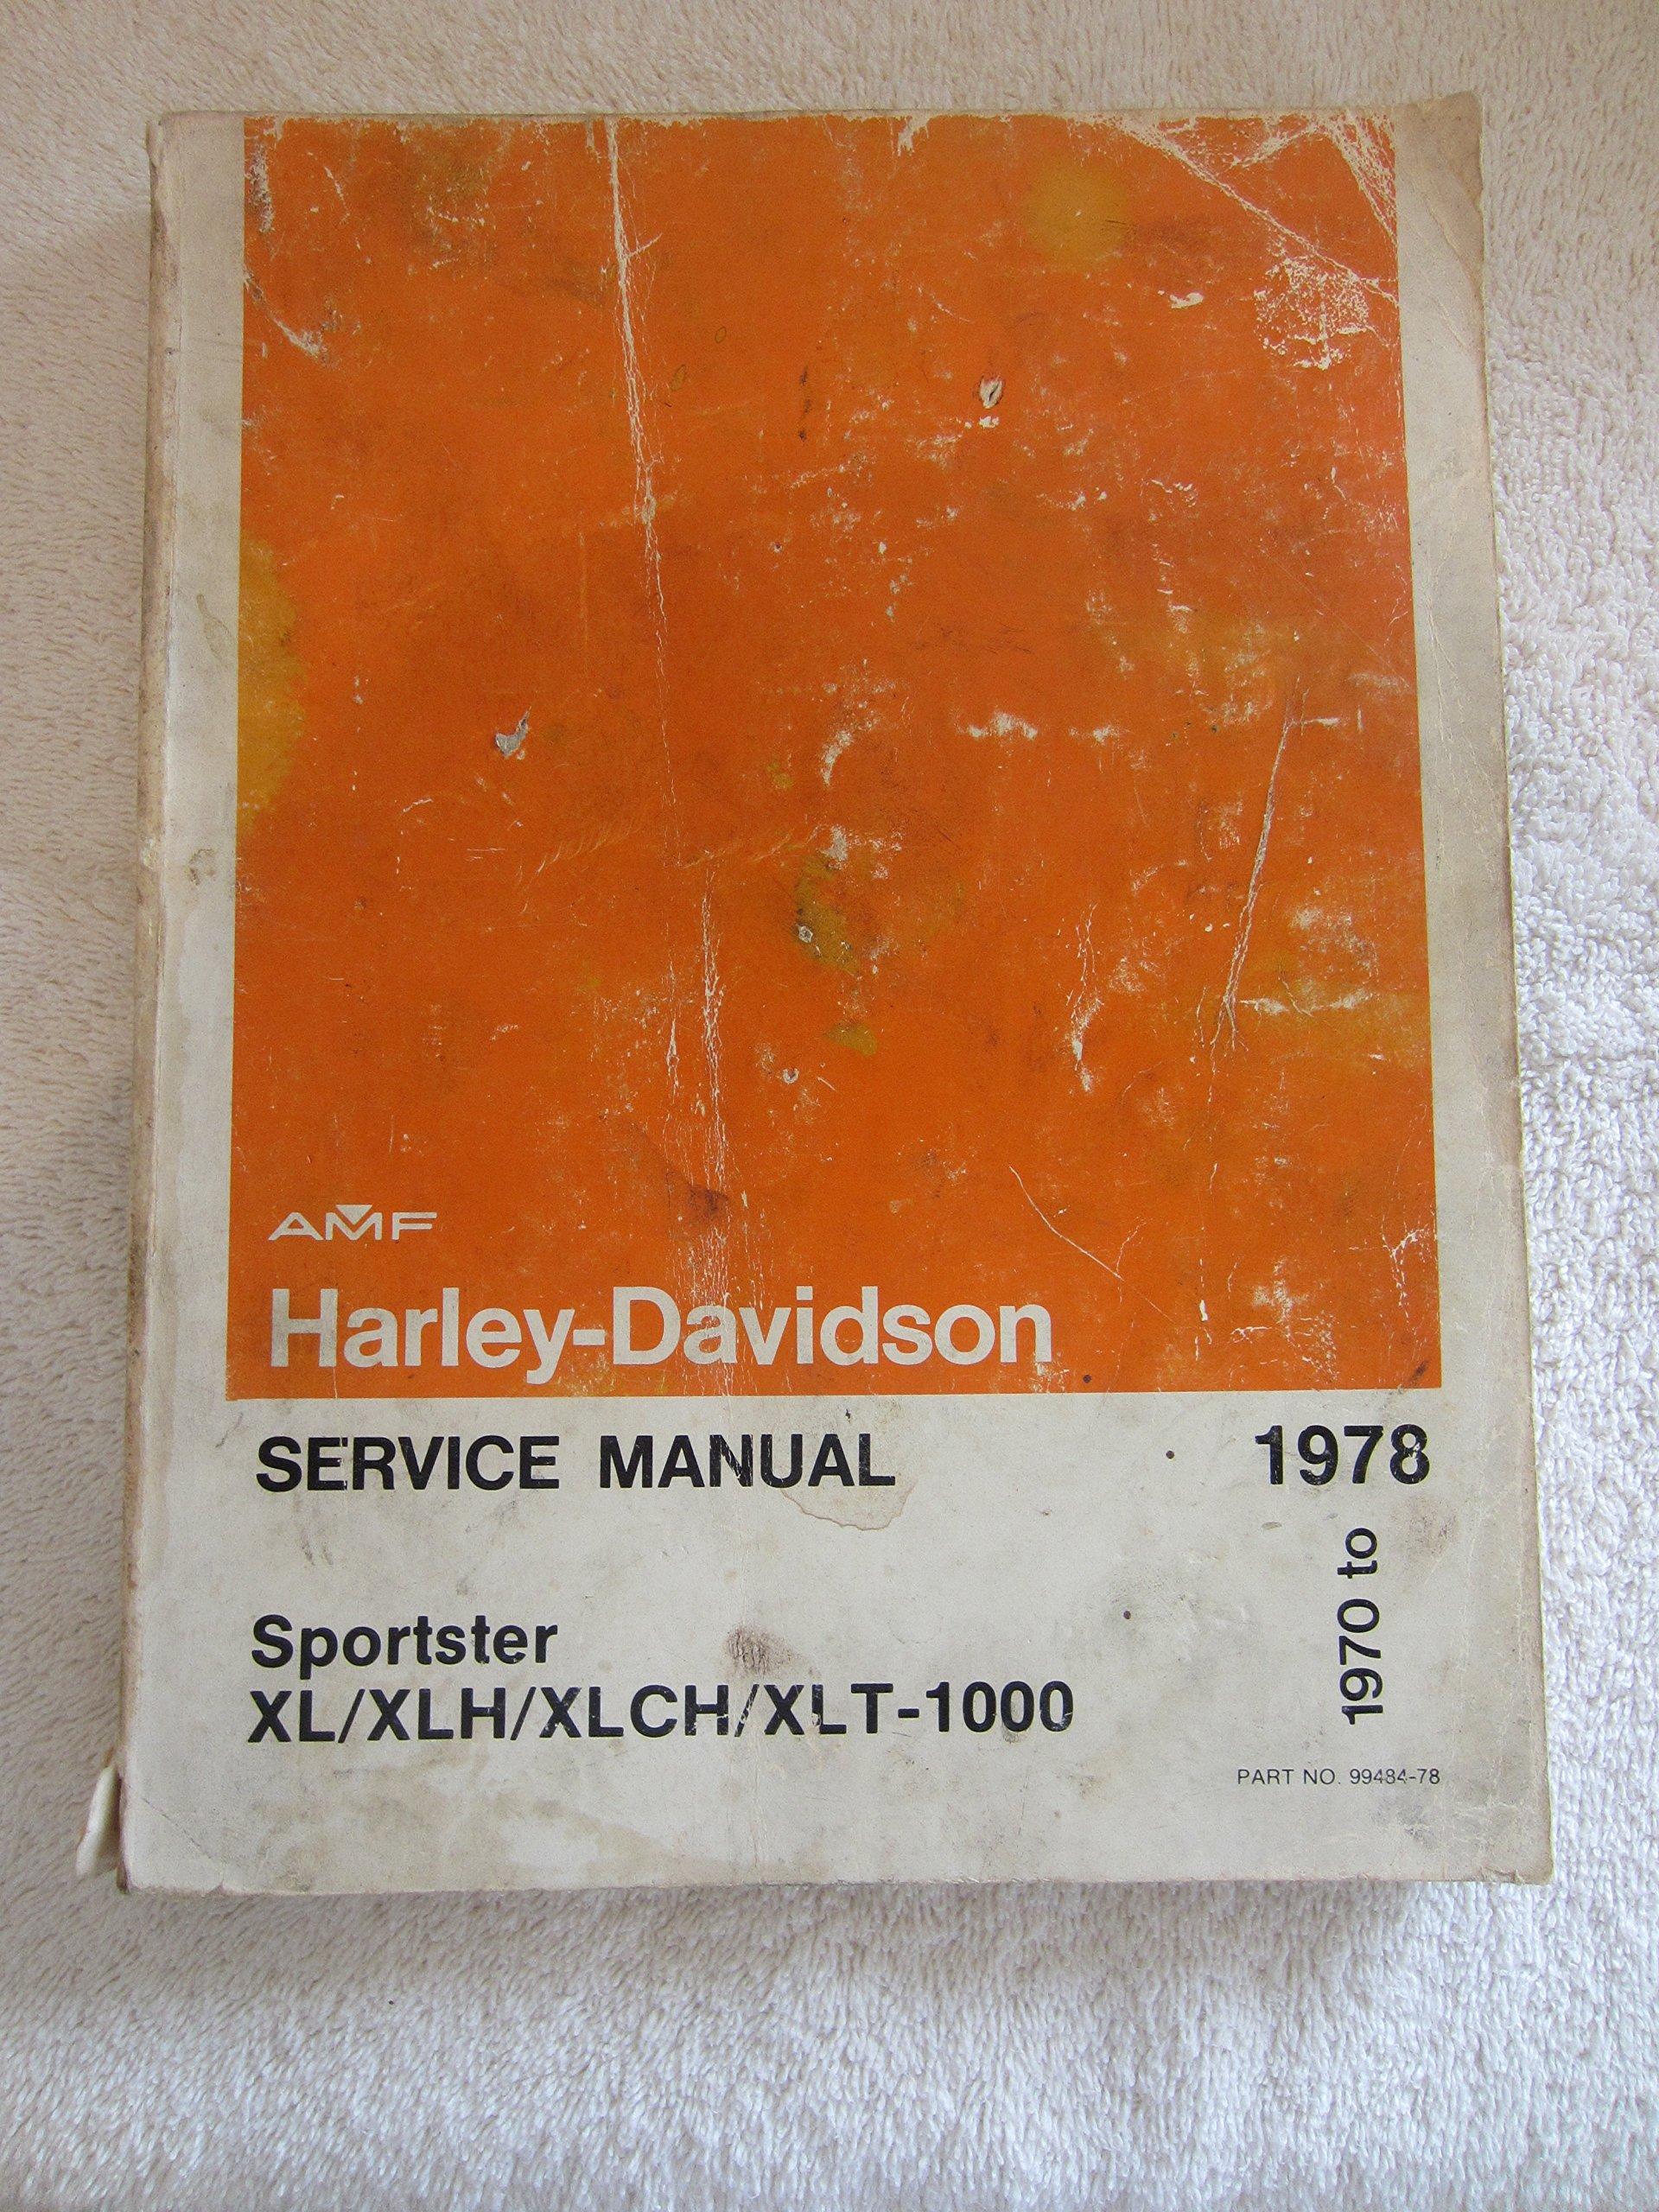 Harley-davidson Service Manual (1970 to 1978) Sportster Xl/xlh/xlch/xlt-1000:  Harley-Davidson: Amazon.com: Books